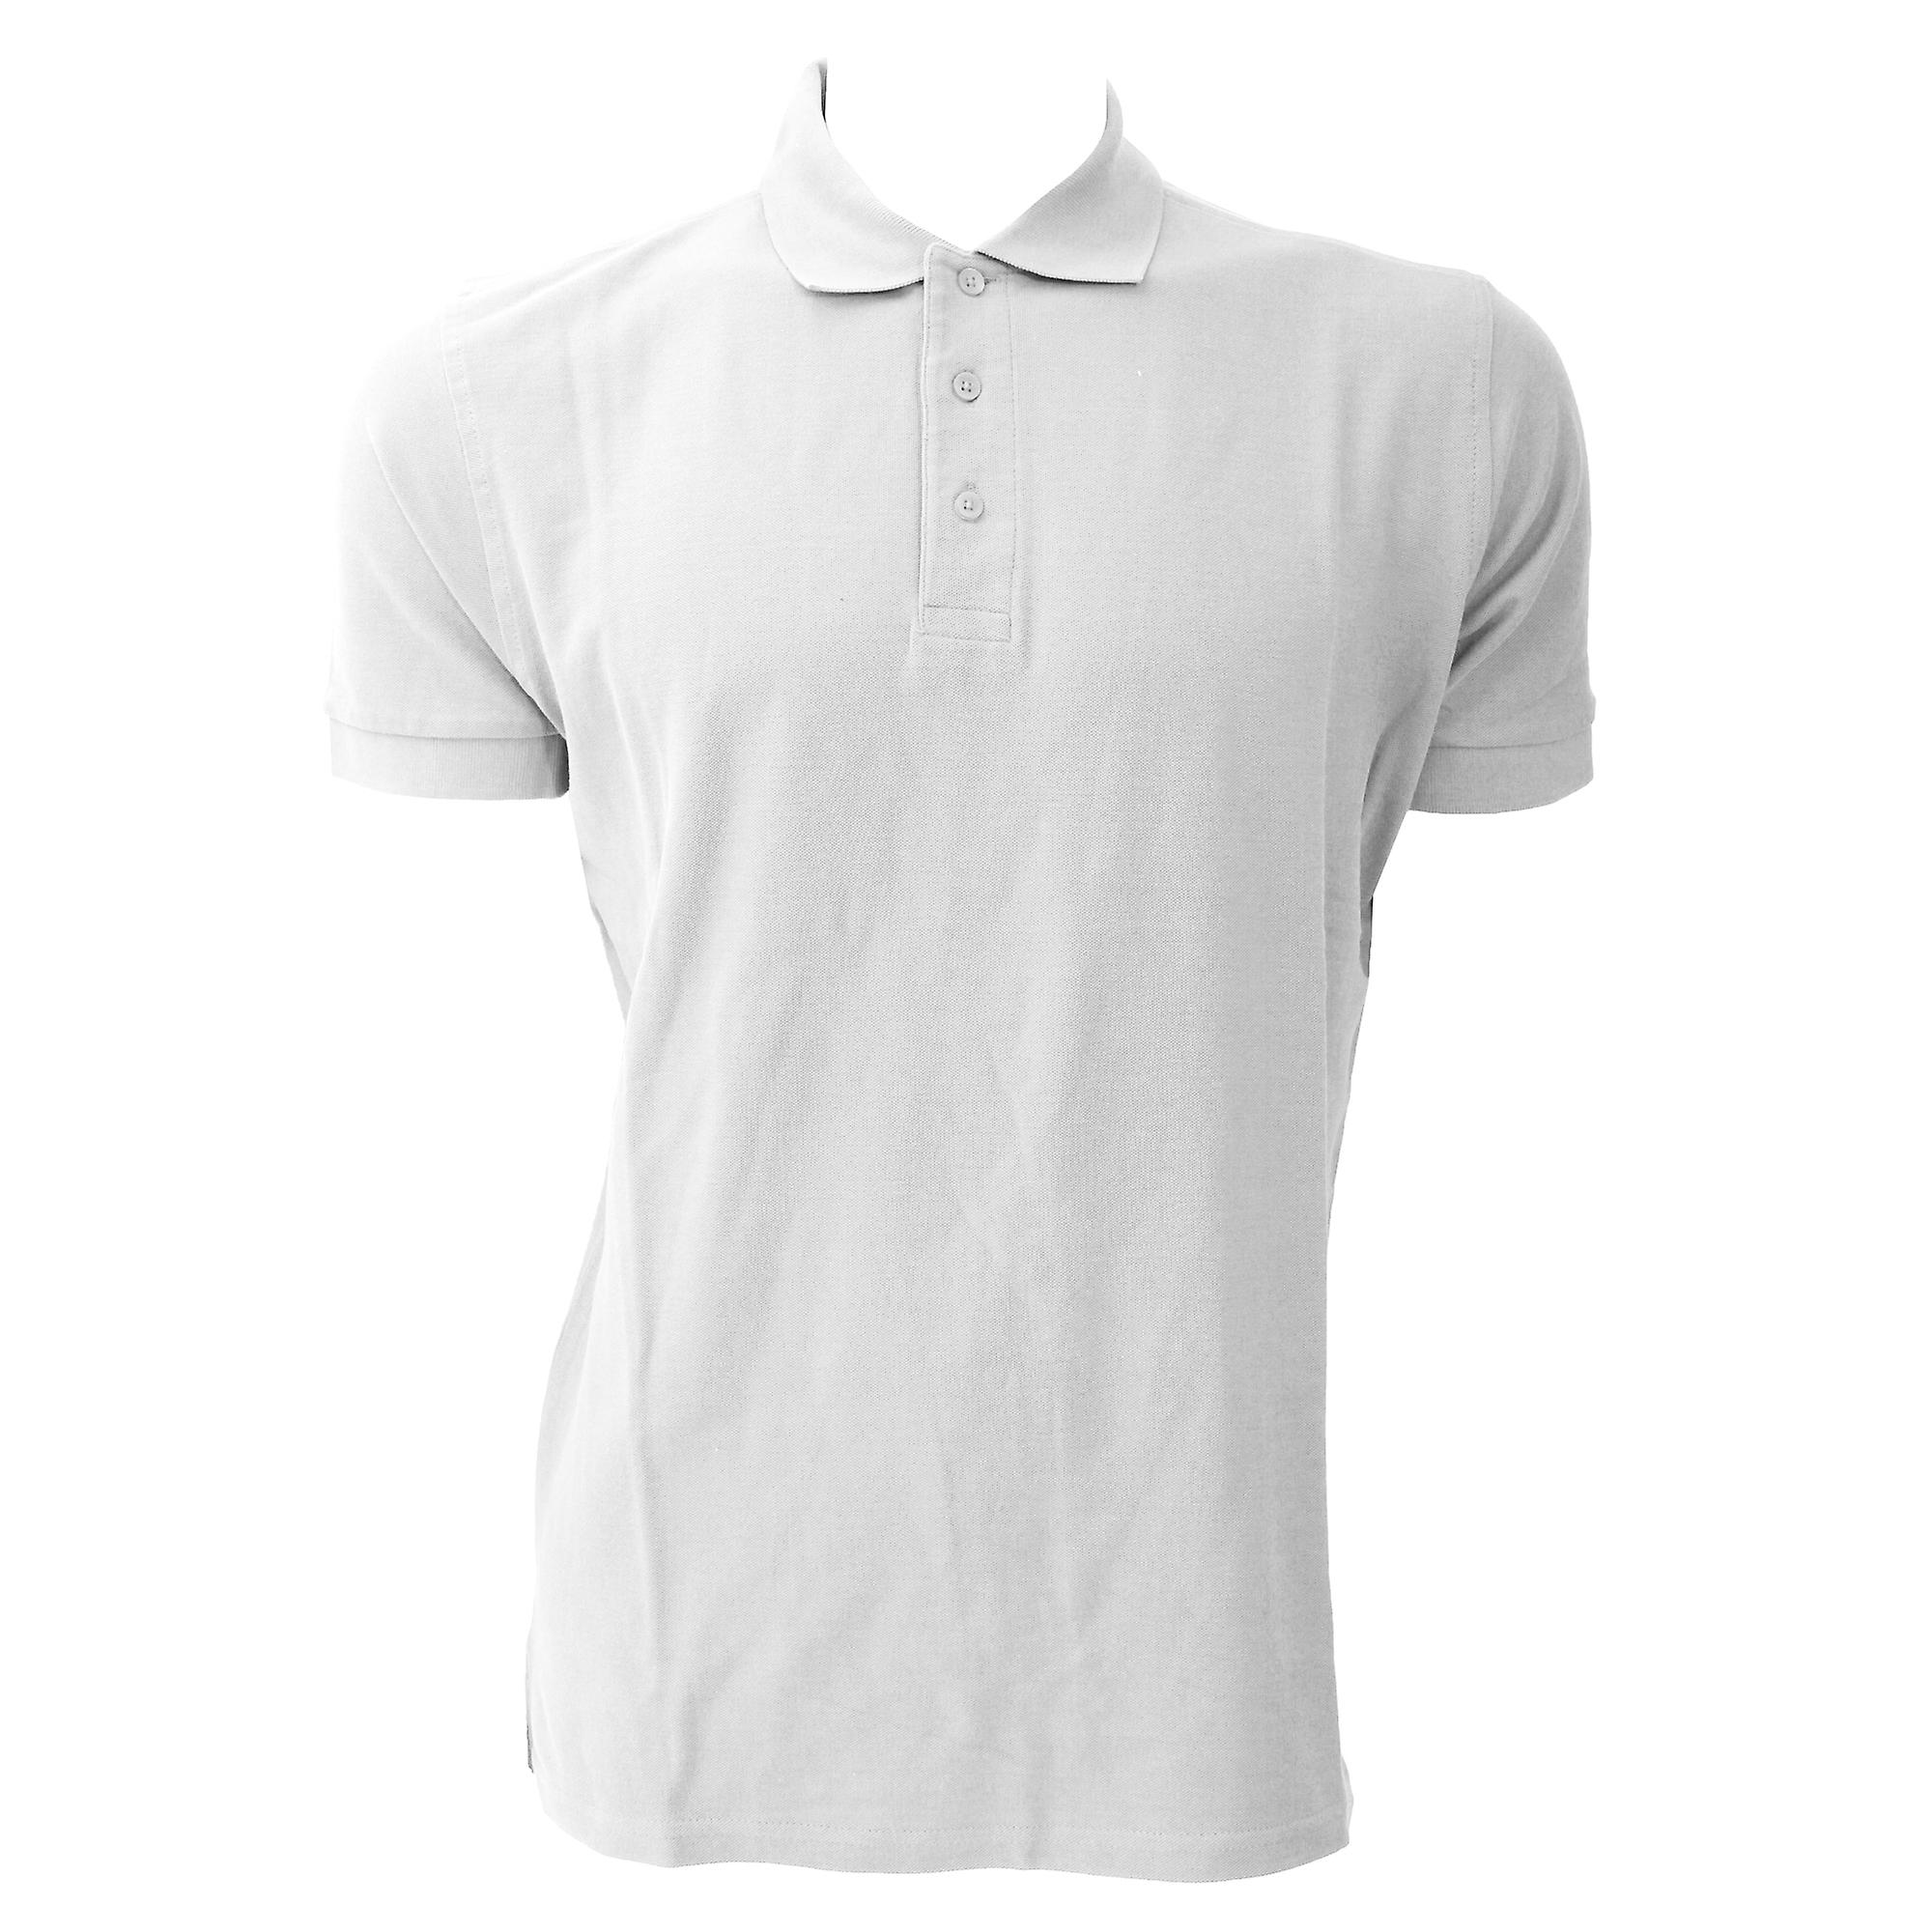 9155c311 Jerzees Colours Mens Ultimate Cotton Short Sleeve Polo Shirt | Fruugo